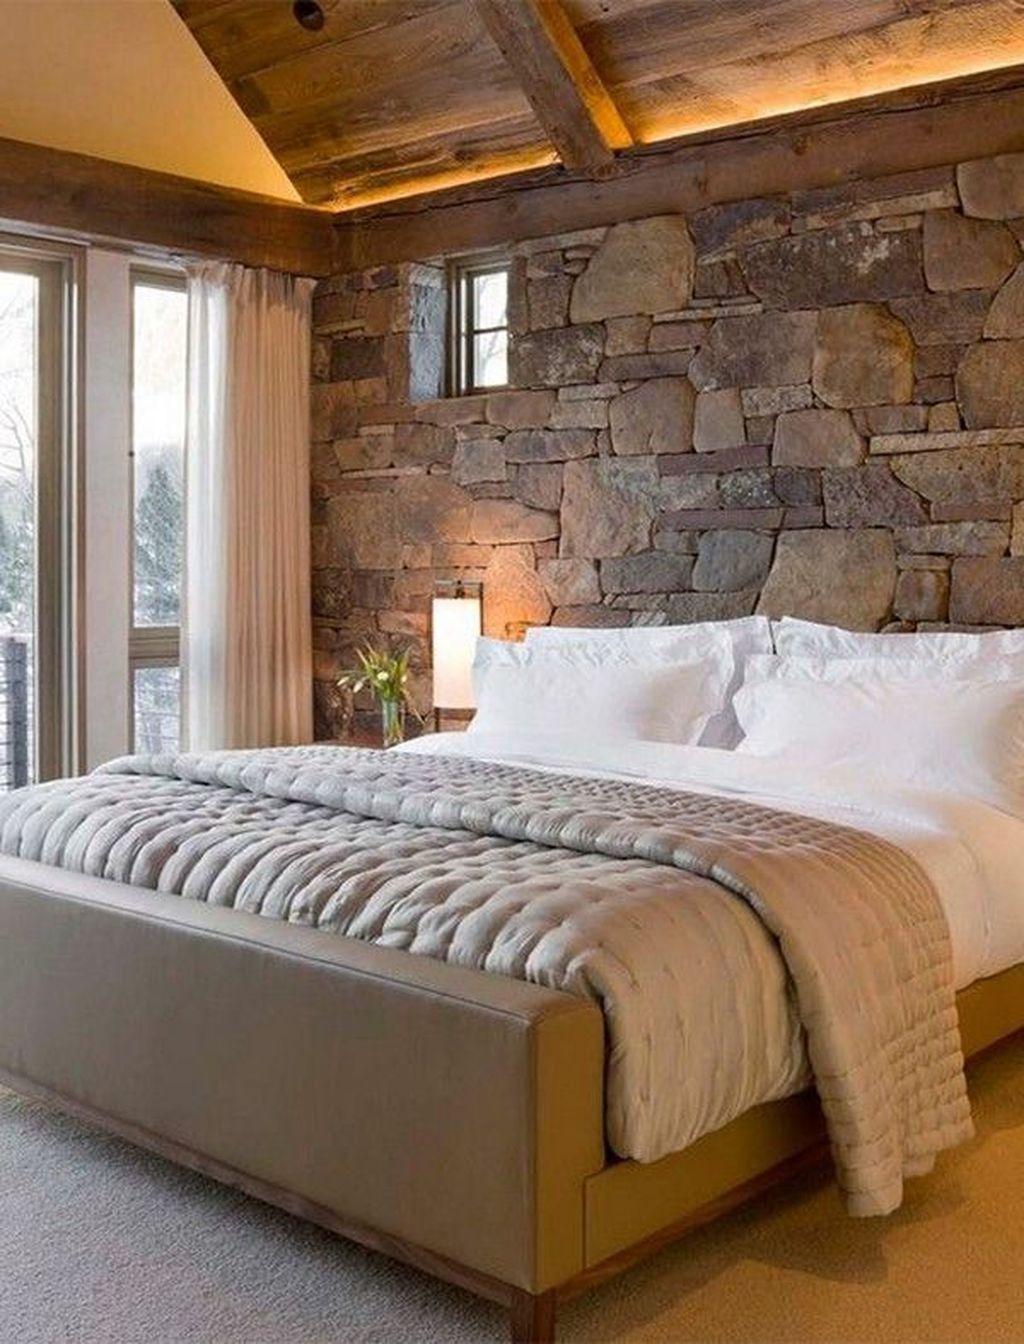 42 Romantic Rustic Farmhouse Bedroom Design And Decorations Ideas images